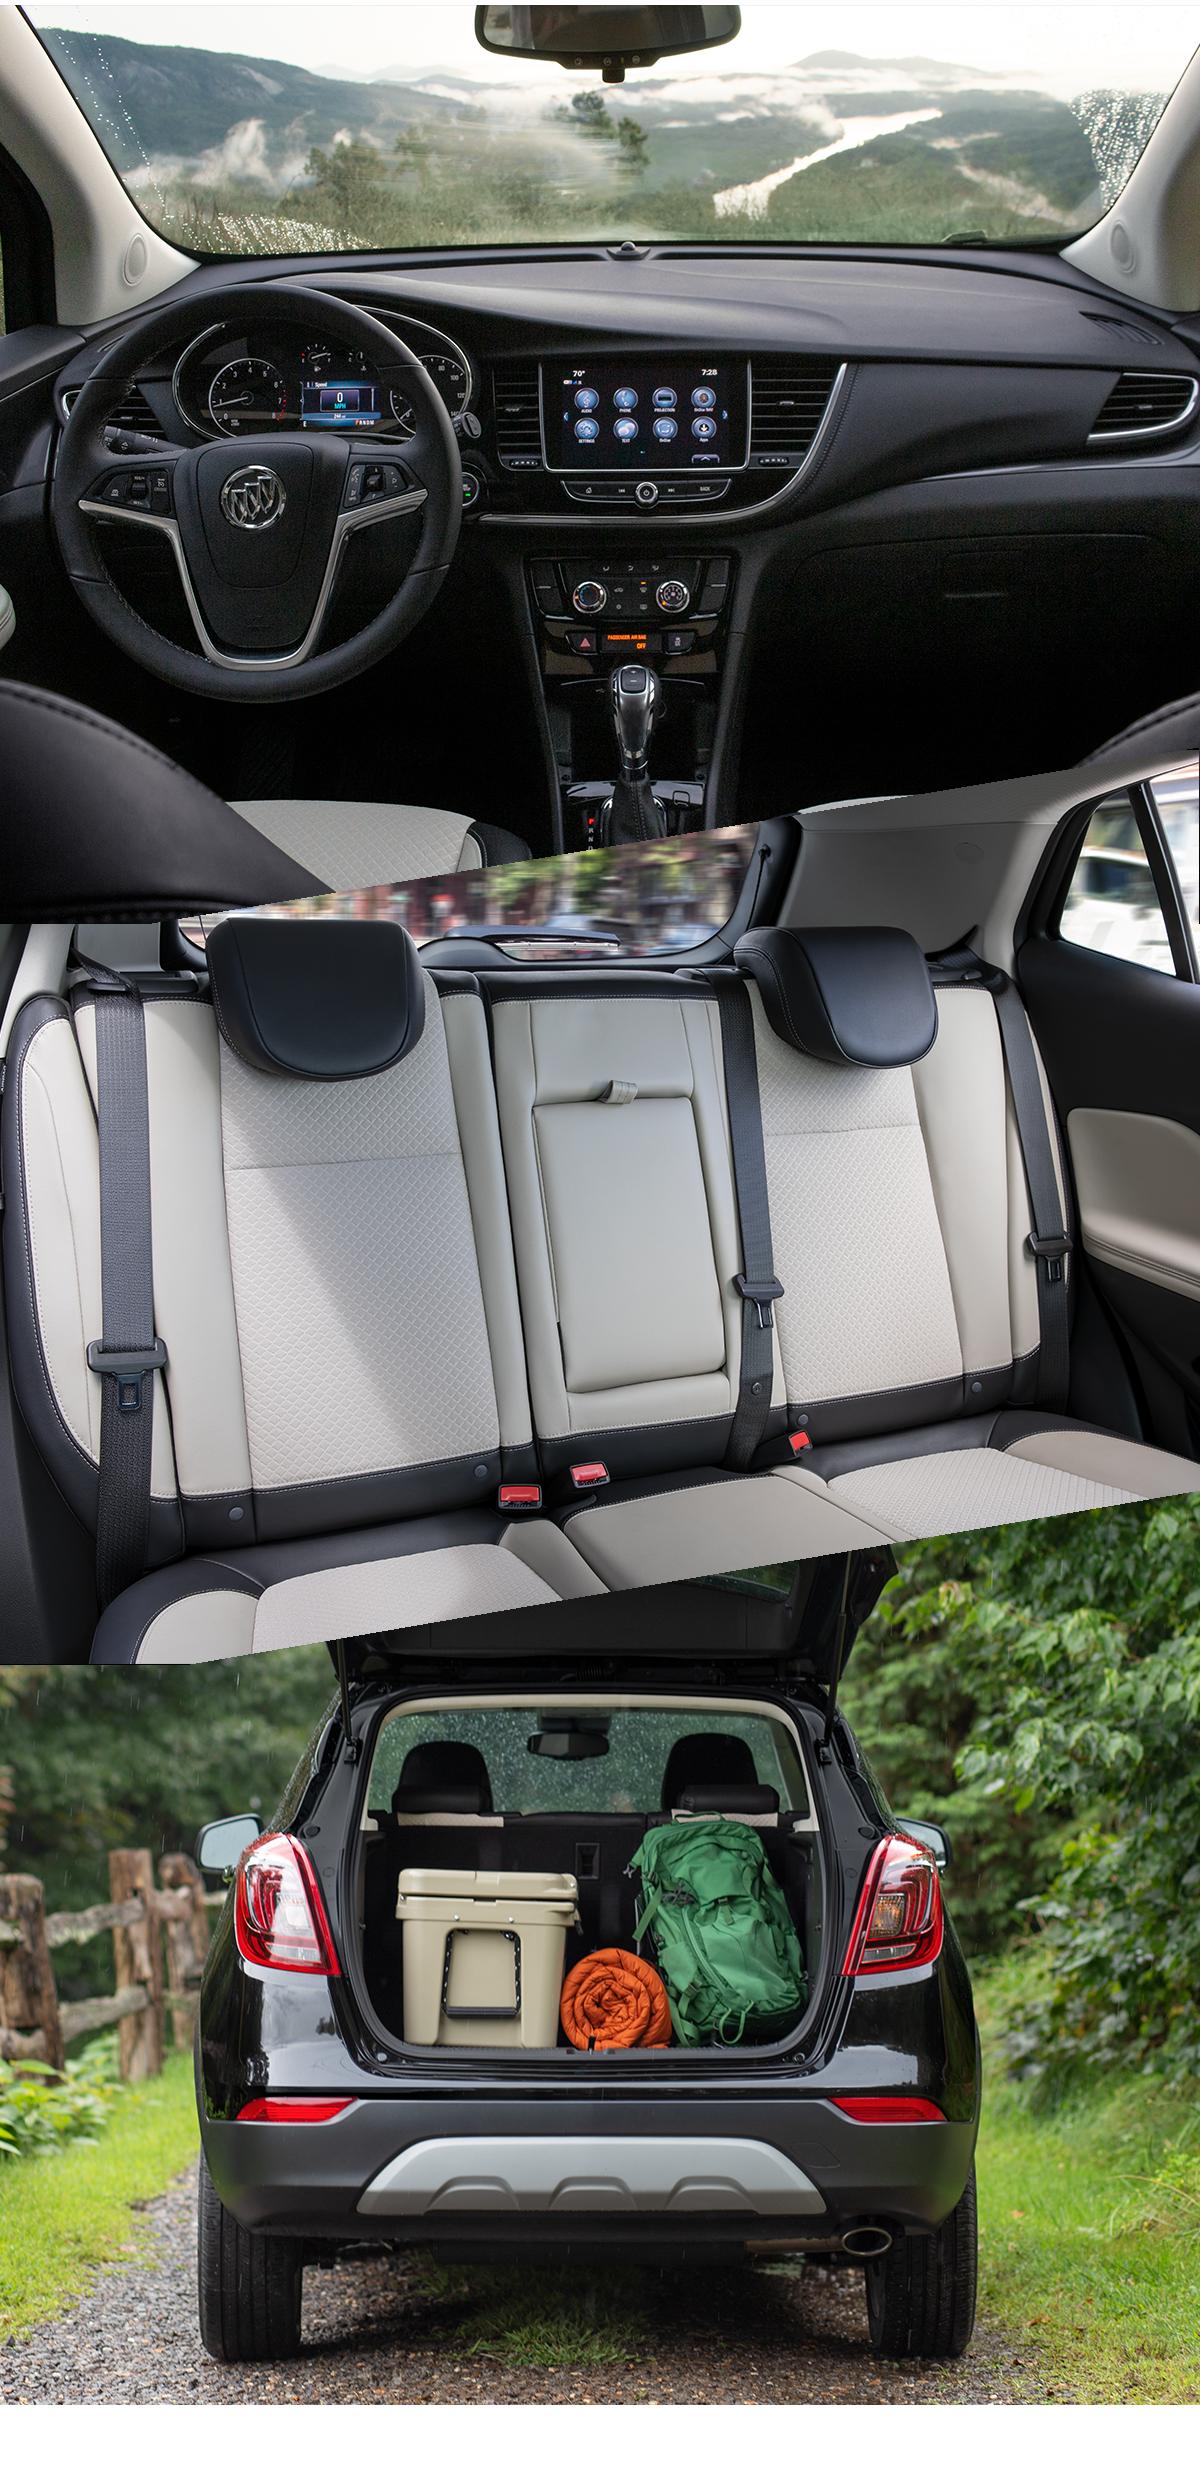 2021 Buick Encore Interior Images in Roanoke, VA